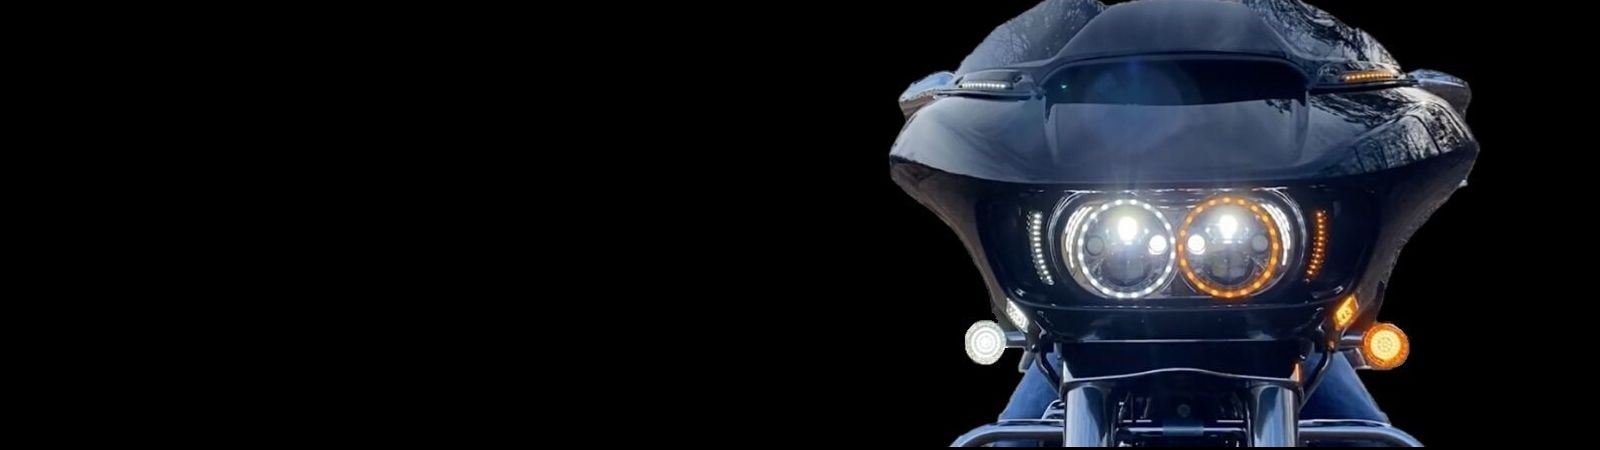 Motorcycle LED Windshield & Fairing Lights